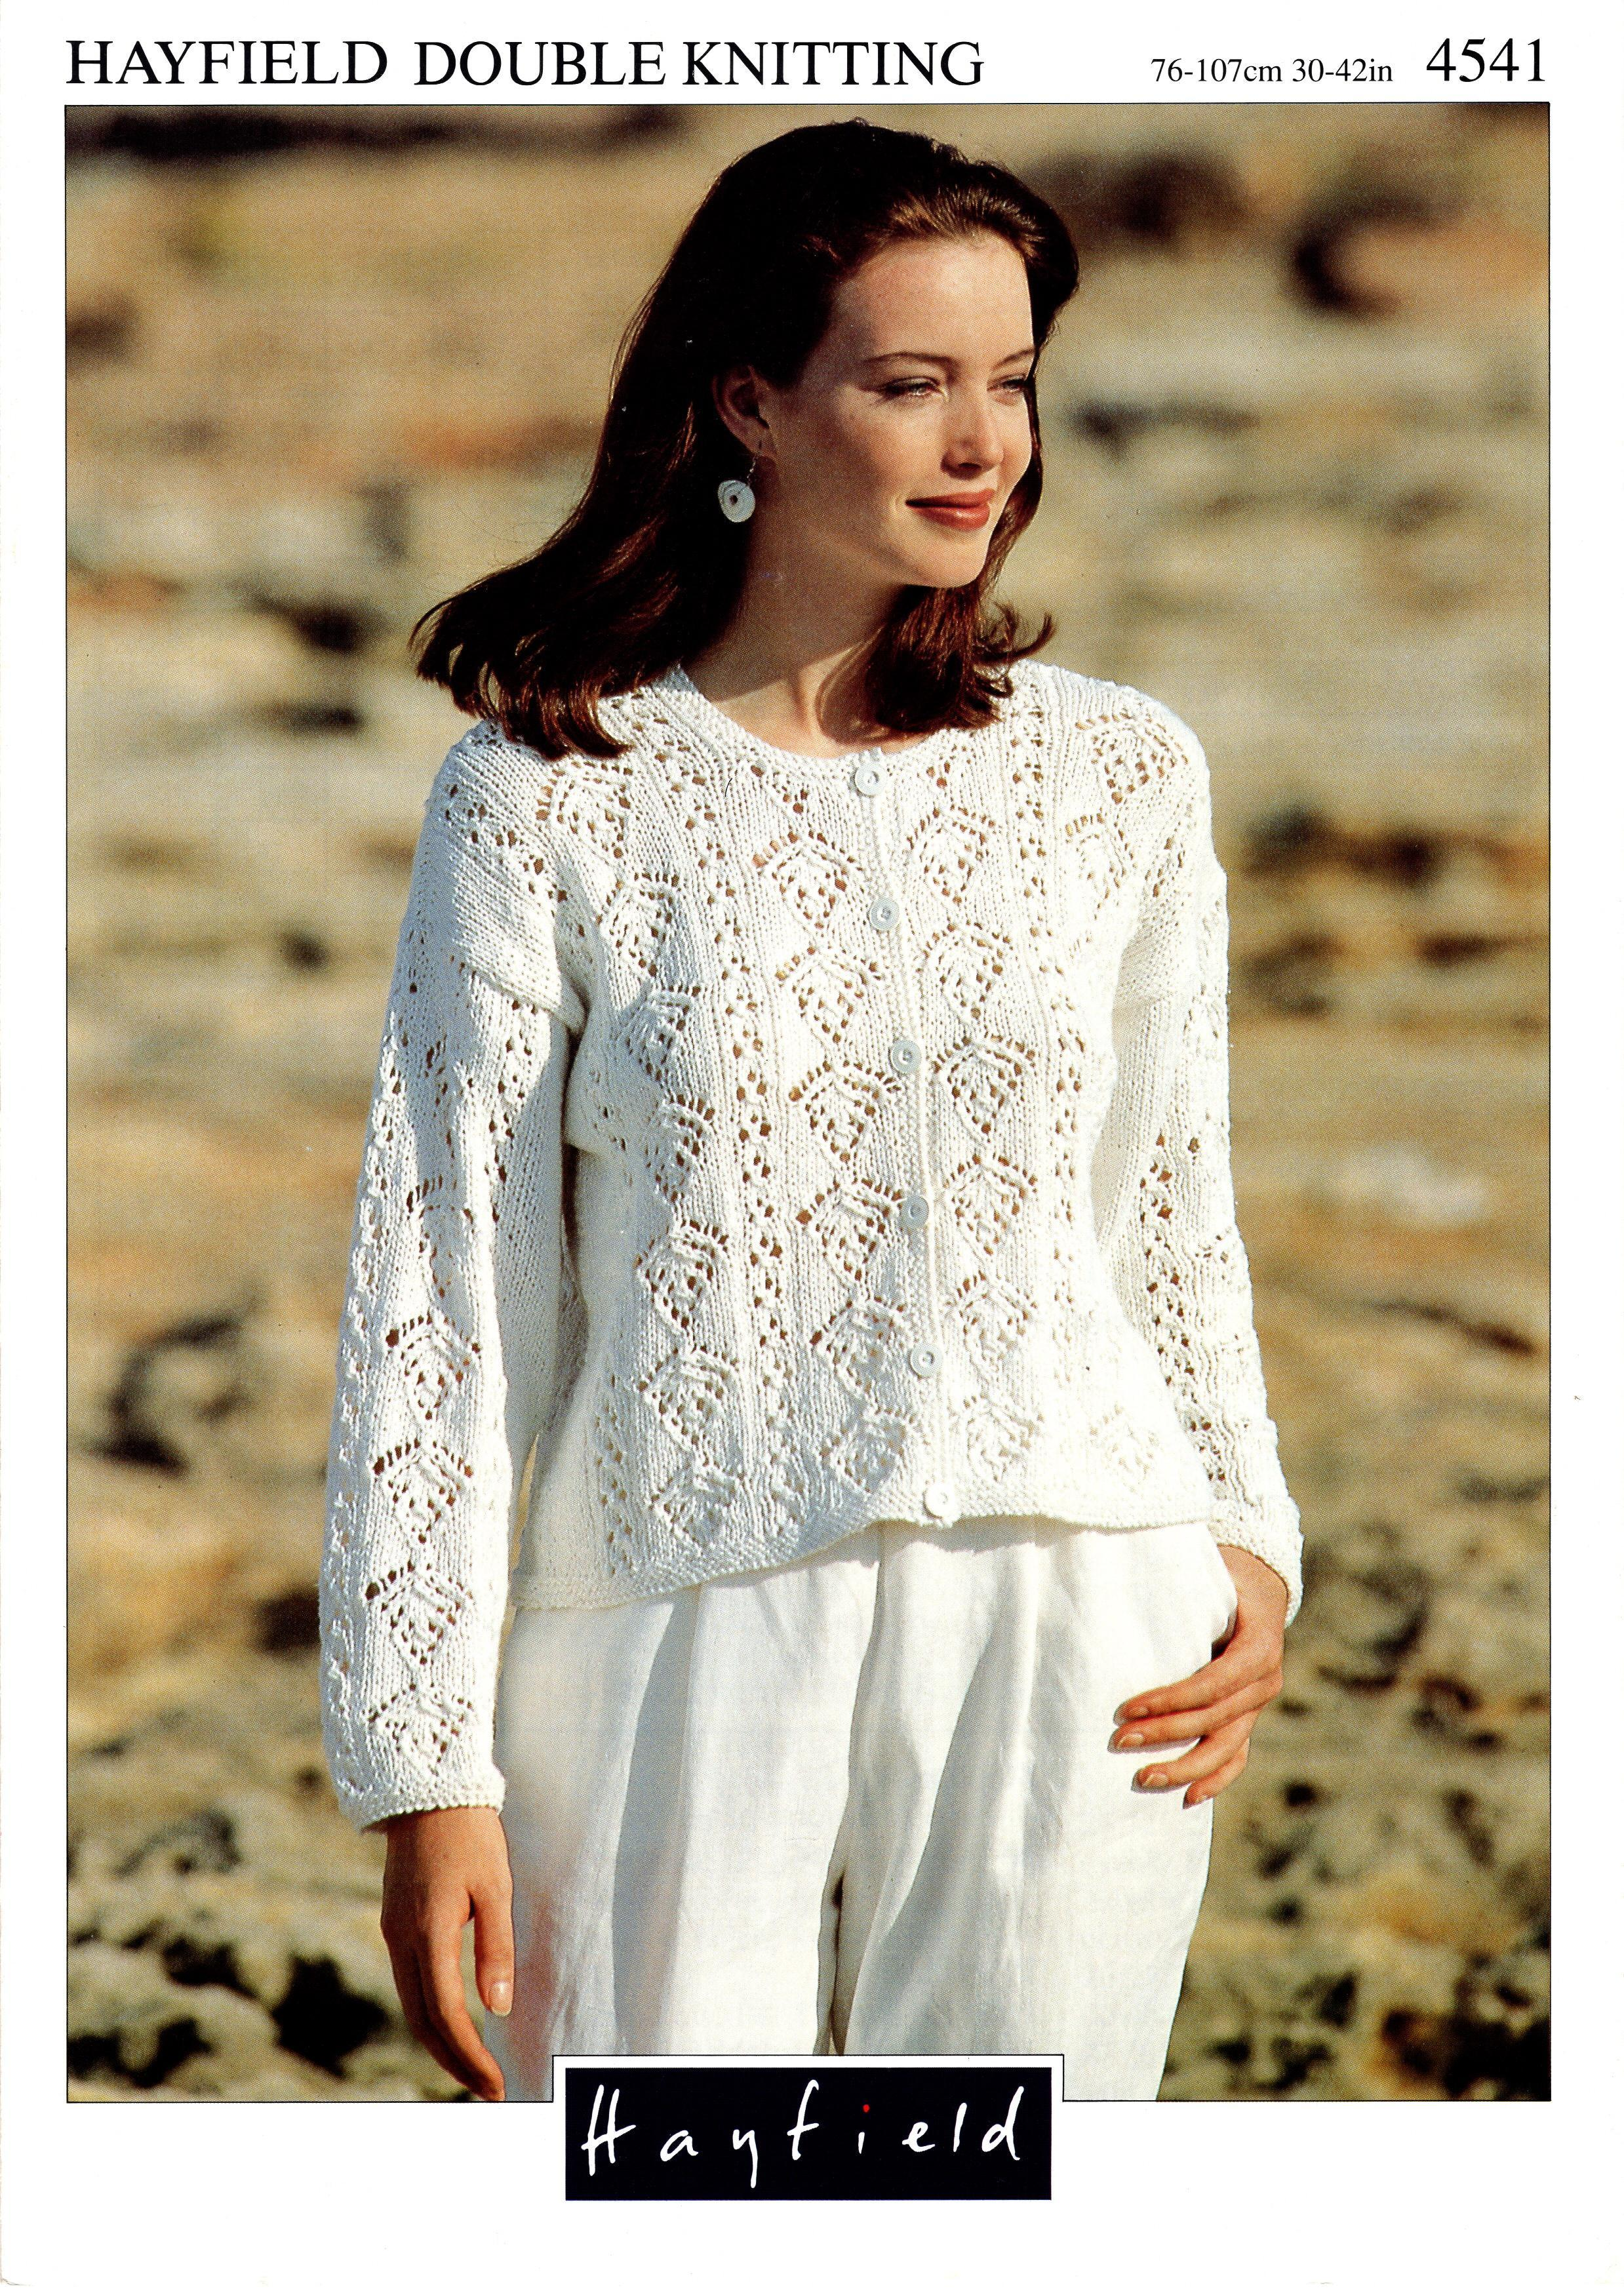 Hayfield Knitting Pattern Booklet No.4541 00029